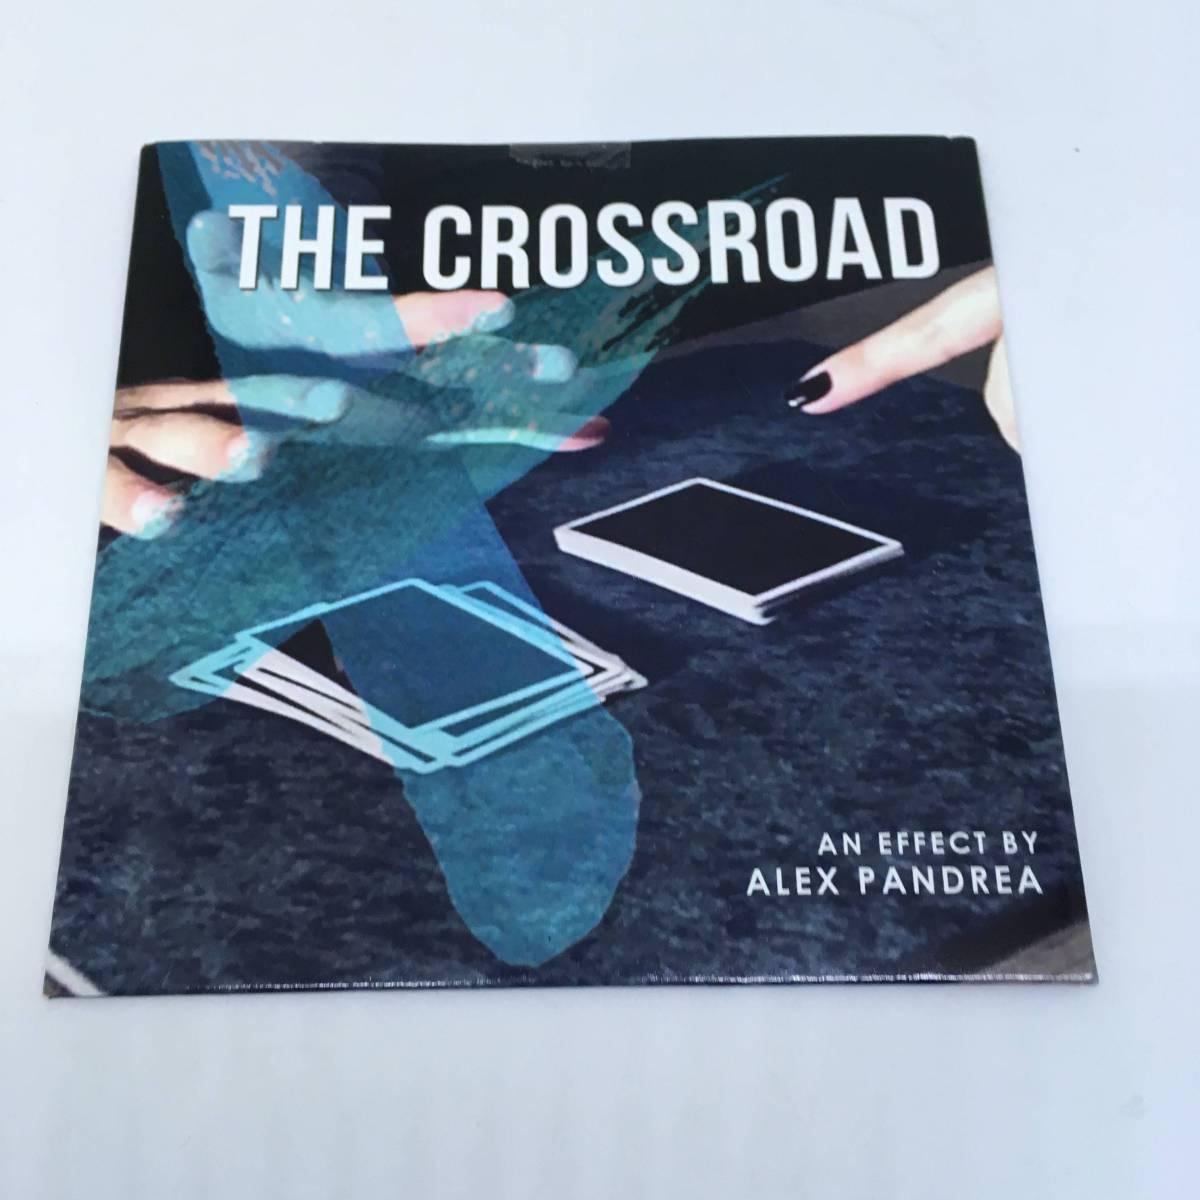 THE CROSSROADS ALEX PANDREA